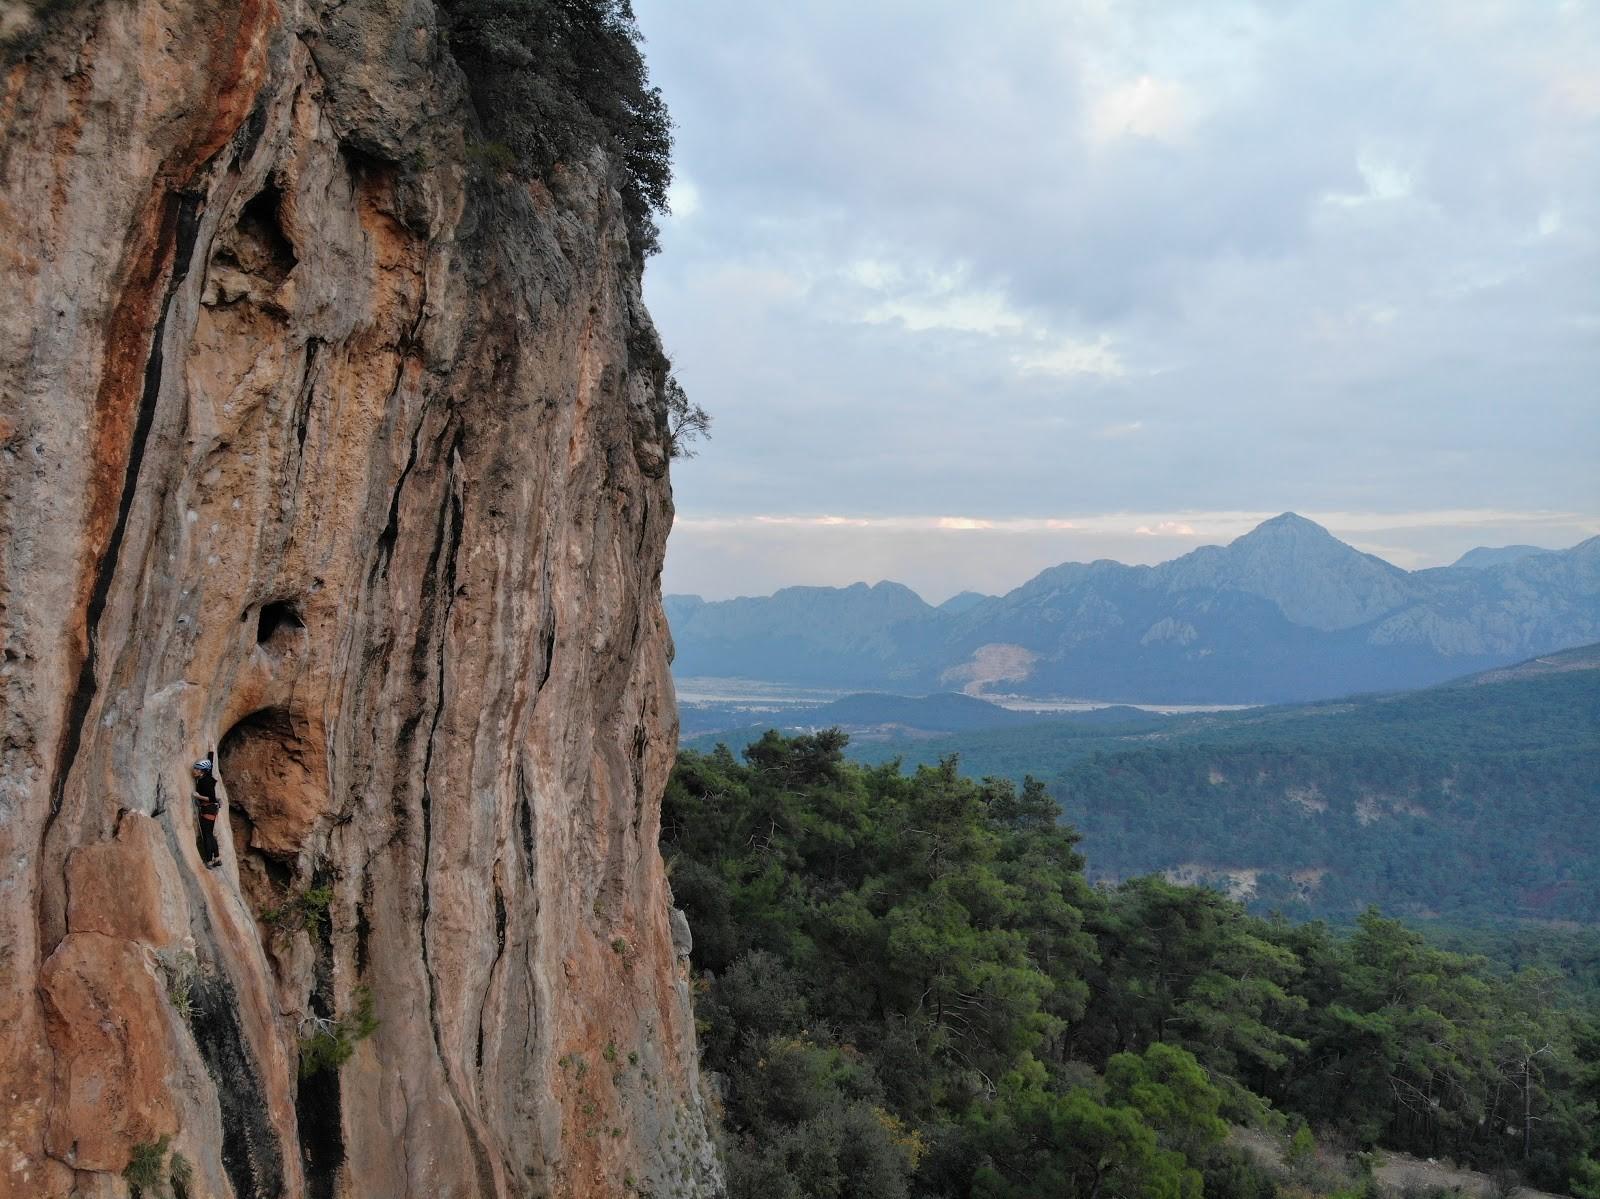 Elif ayata geyikbayırı kaya tırmanışı antalya